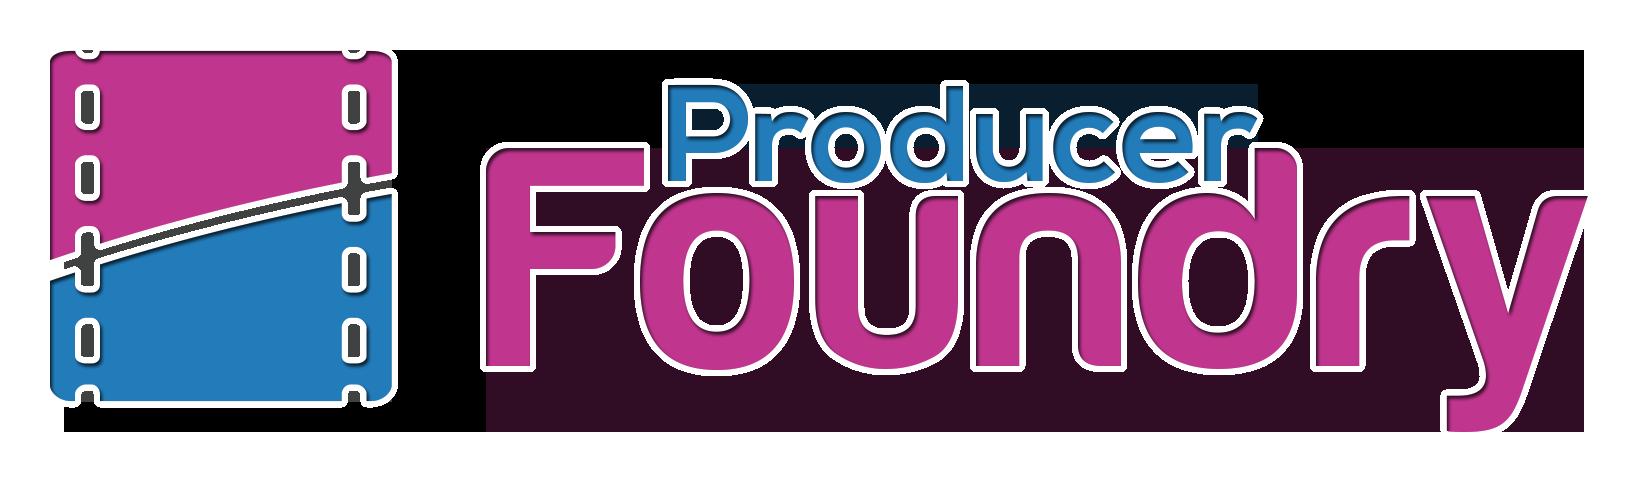 producerfoundrytransparentwhiteglow